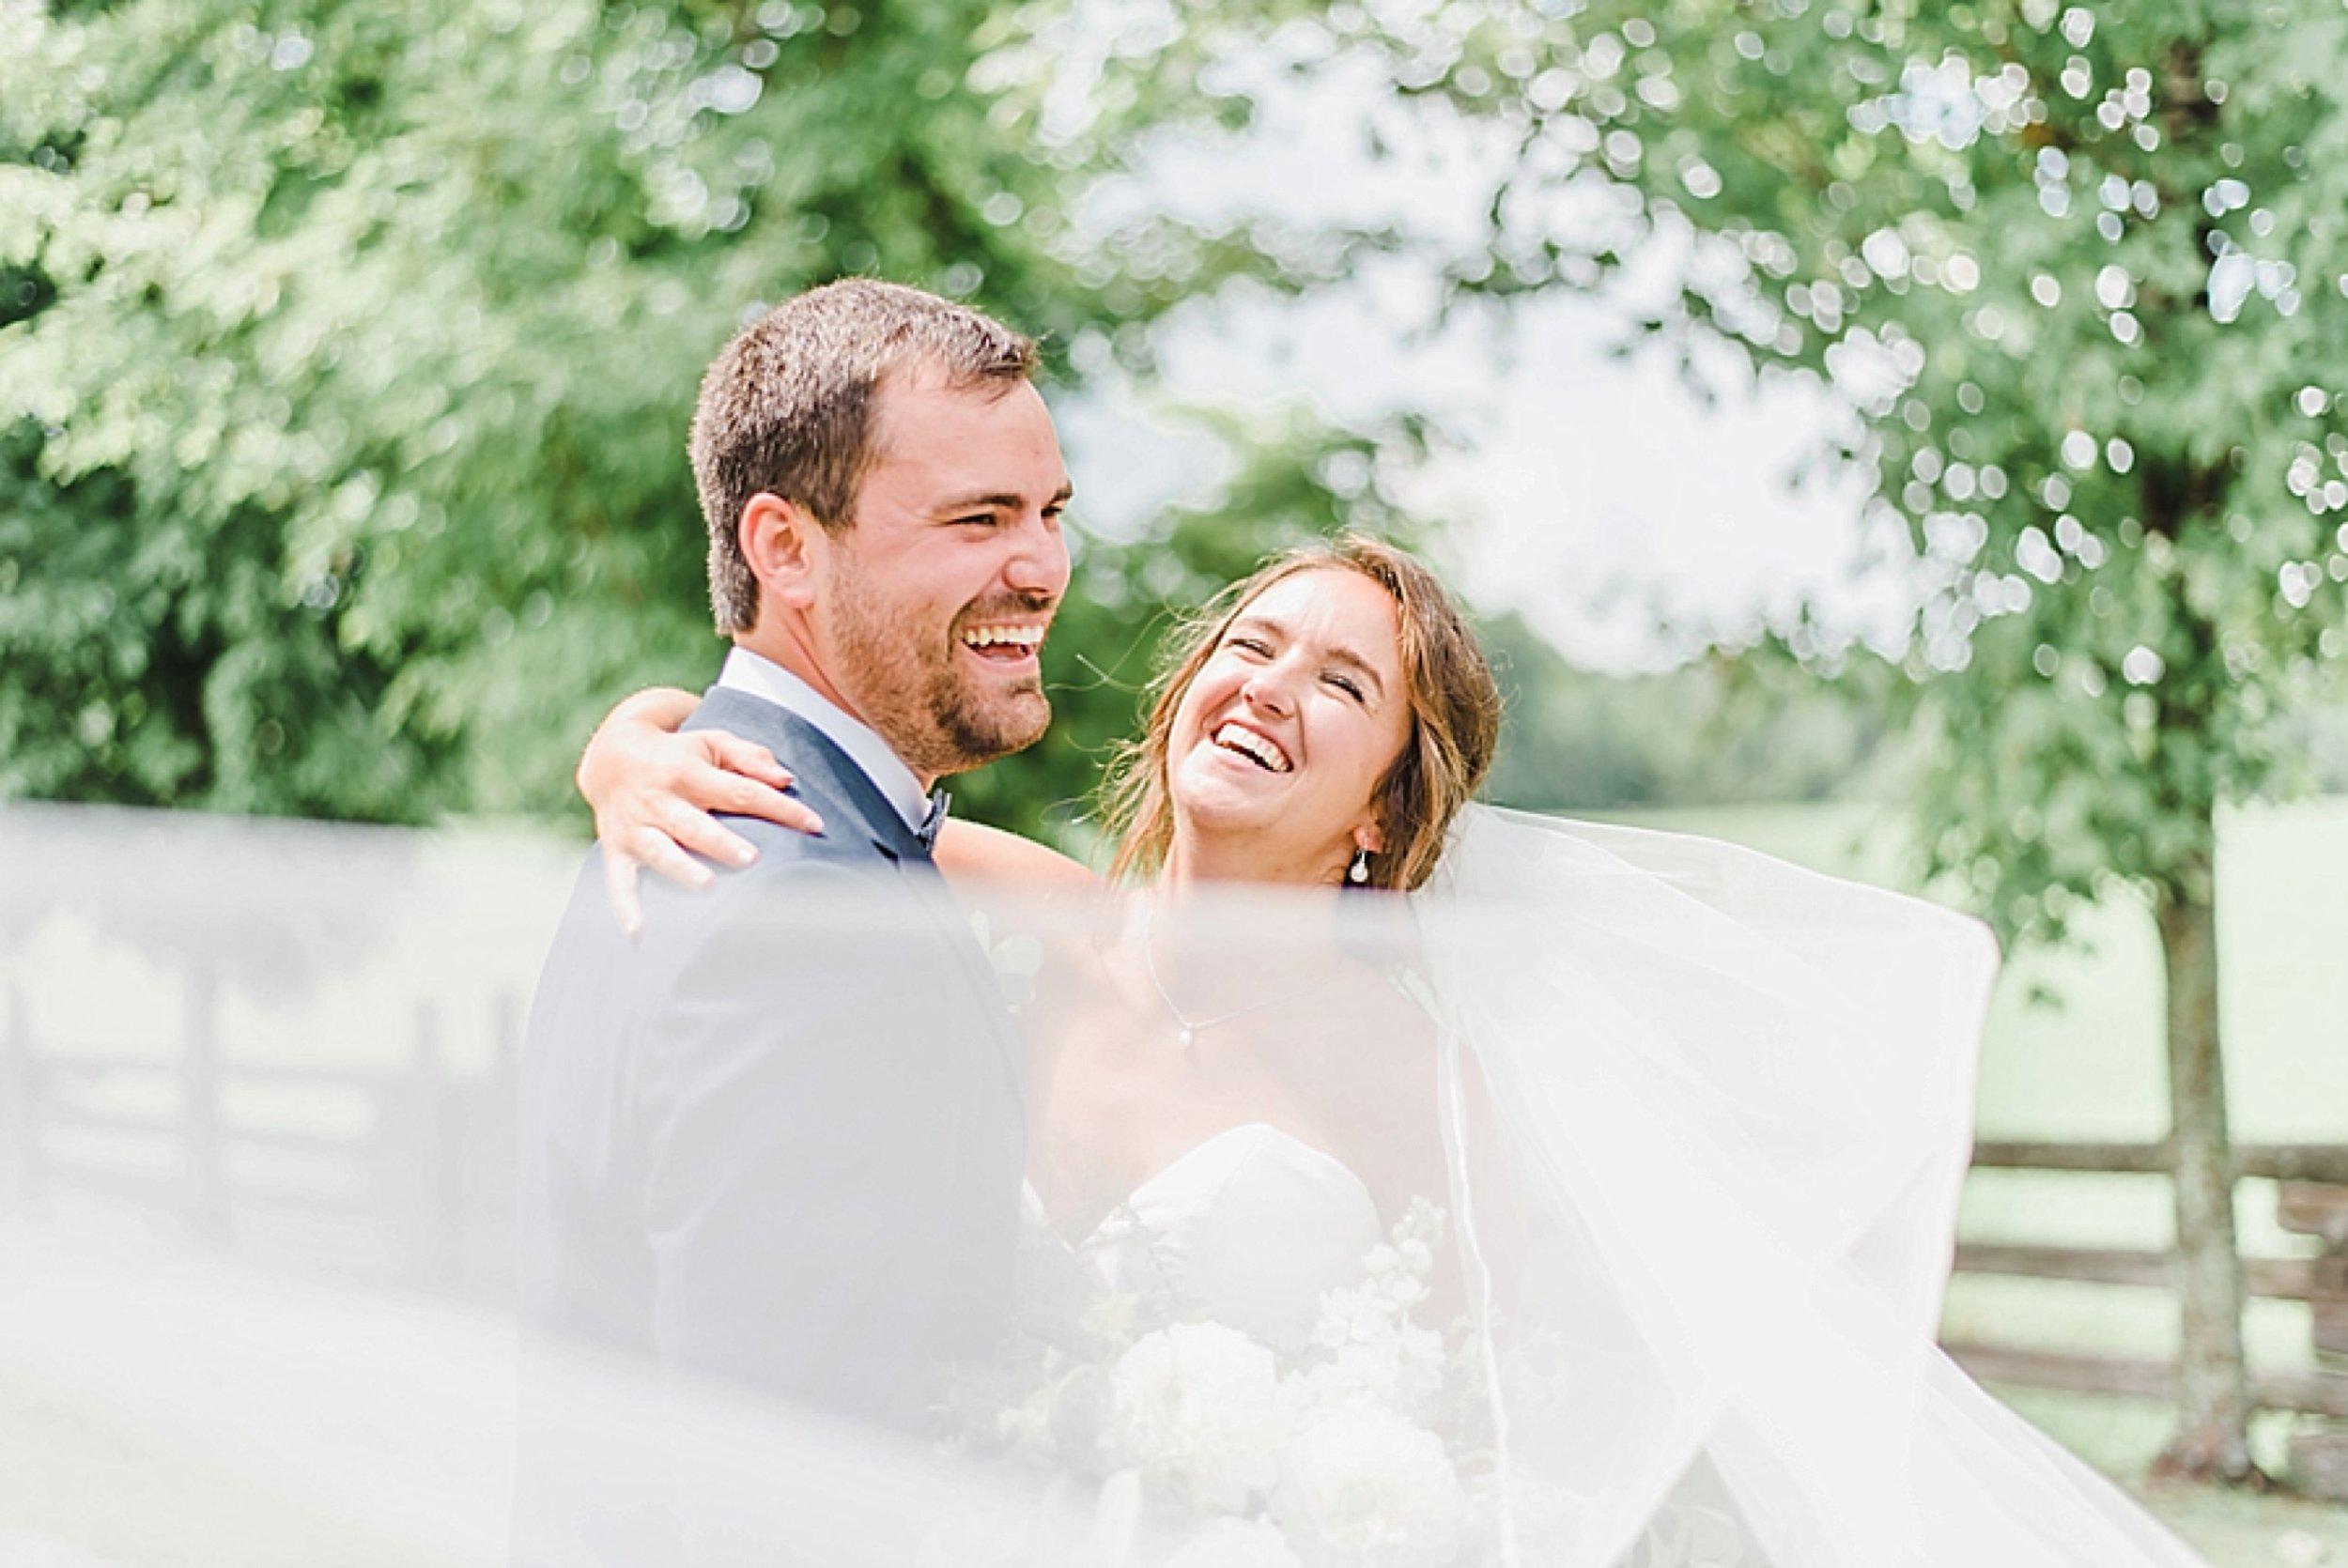 light airy indie fine art ottawa wedding photographer | Ali and Batoul Photography_0509.jpg